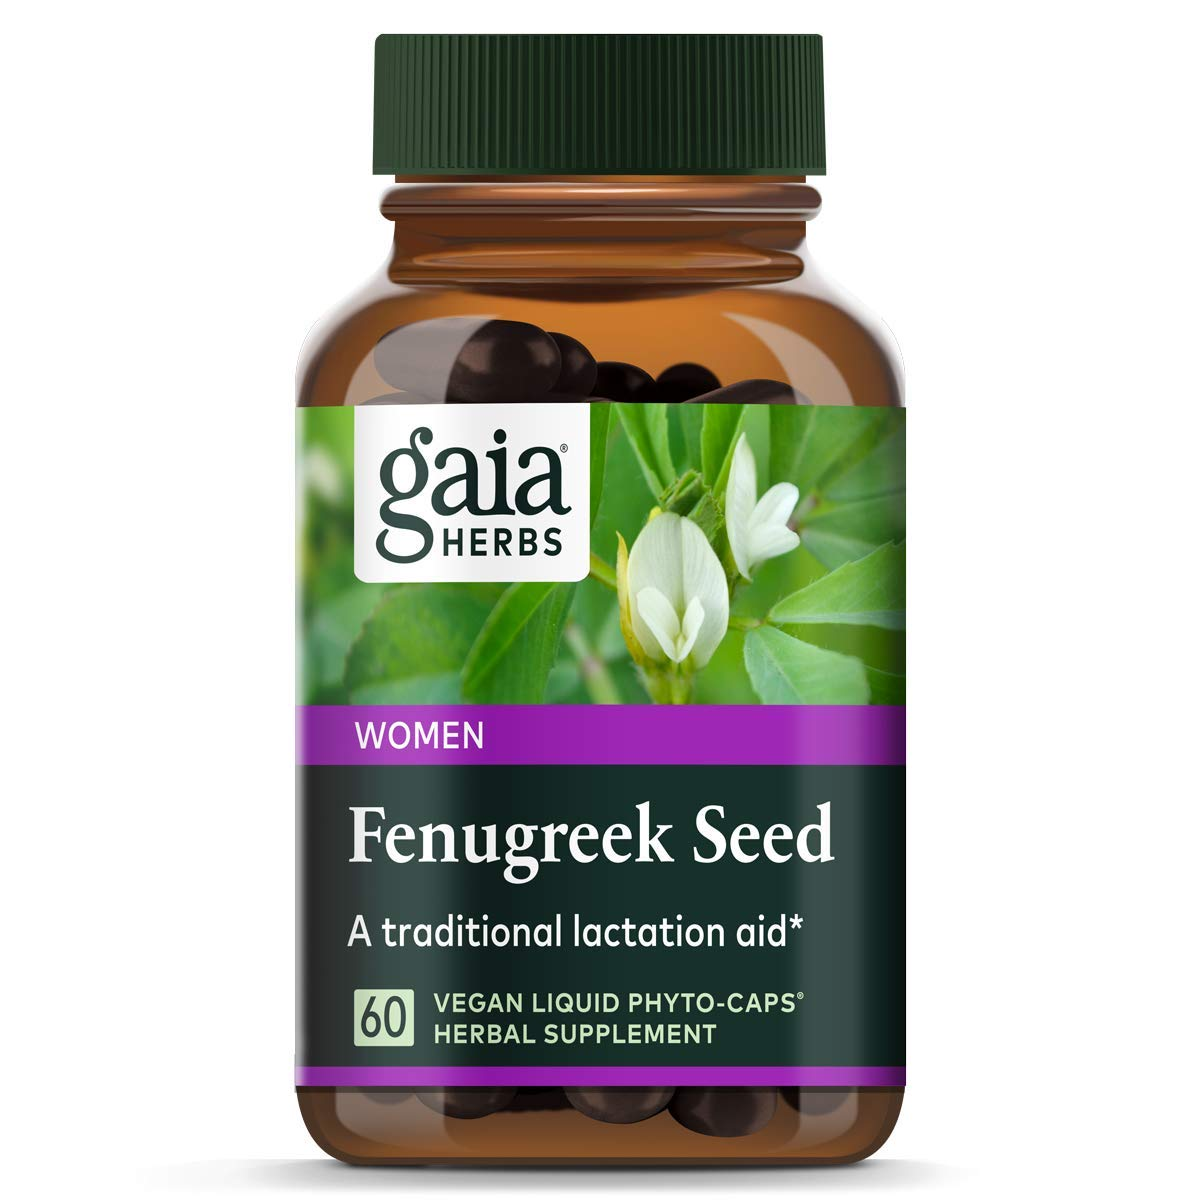 Gaia Herbs Fenugreek Seed, Vegan Liquid Capsules, 60 Count - Lactation Supplement with Organic Fenugreek to Optimize Breast Milk Production